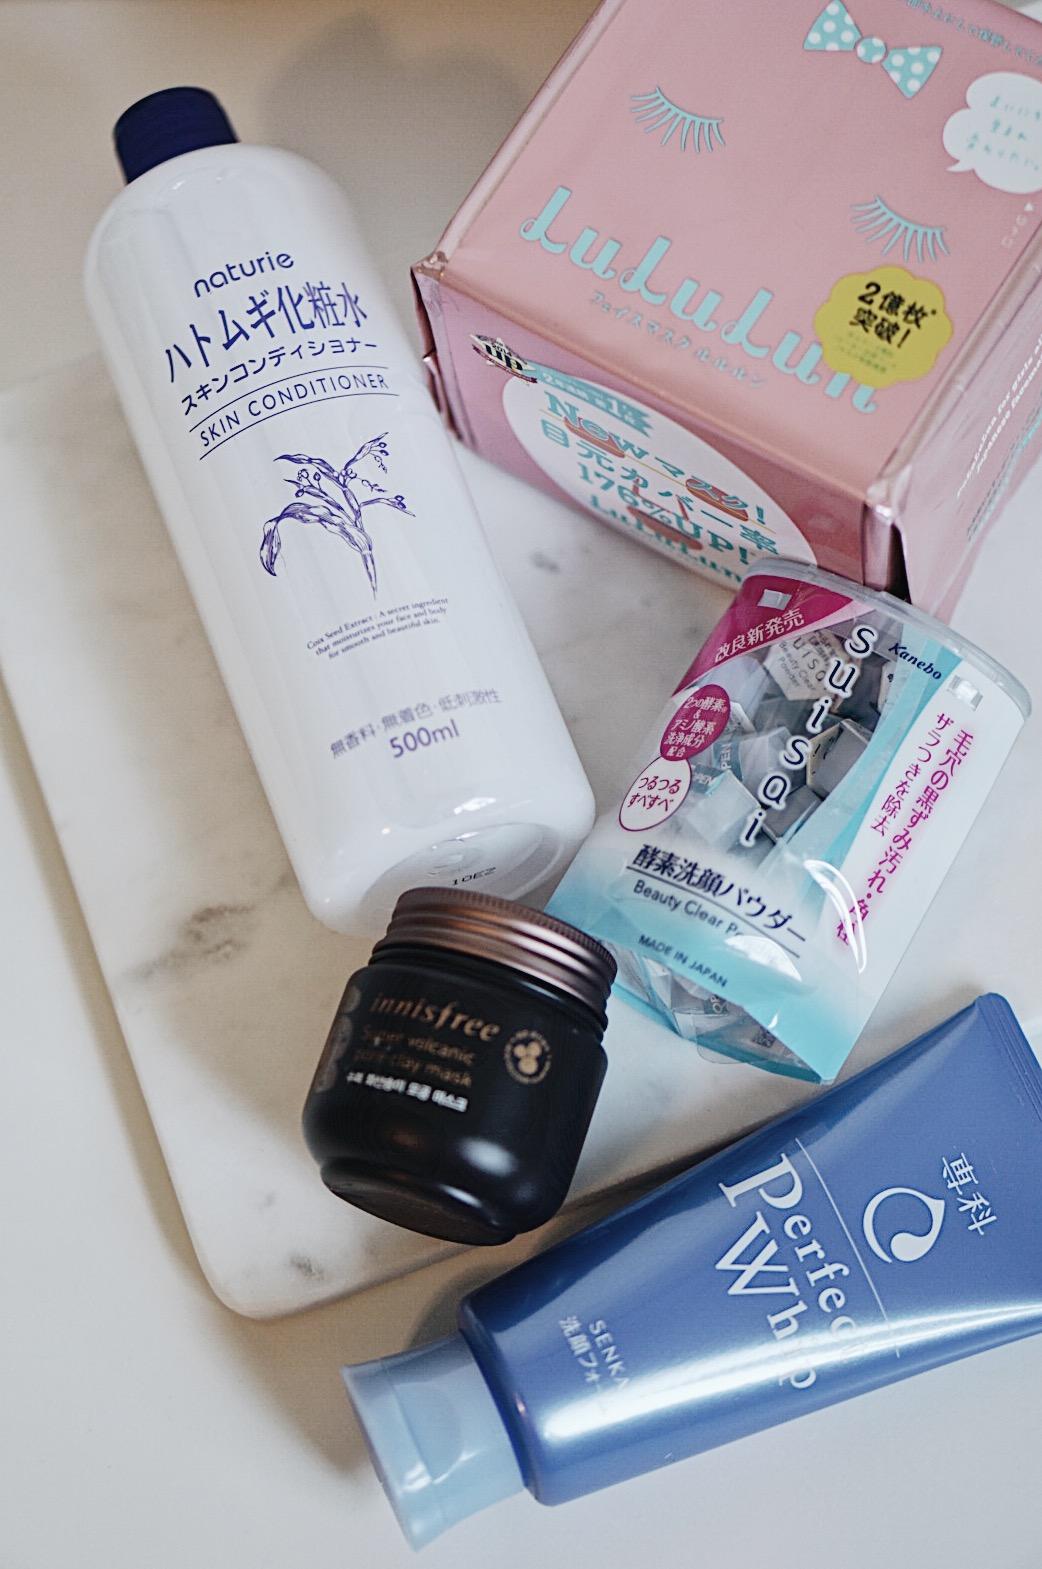 Asian Skincare To Buy: Lululun, Senka, Suisai, innisfree, Naturie Hatomugi